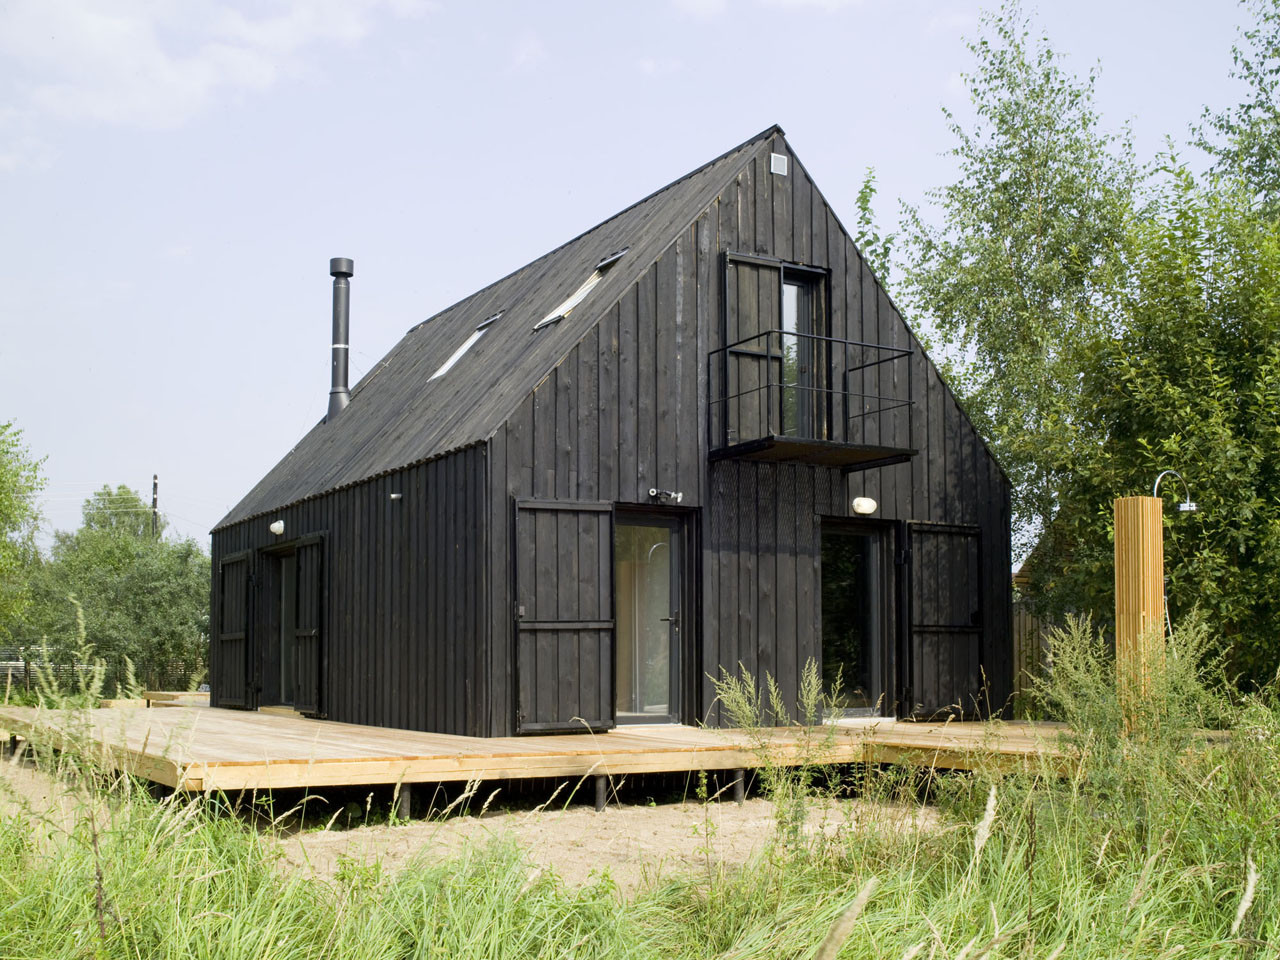 Casa VolgaDacha / Bureau Bernaskoni, © Vlad Efimov / Oleg Dyachenko